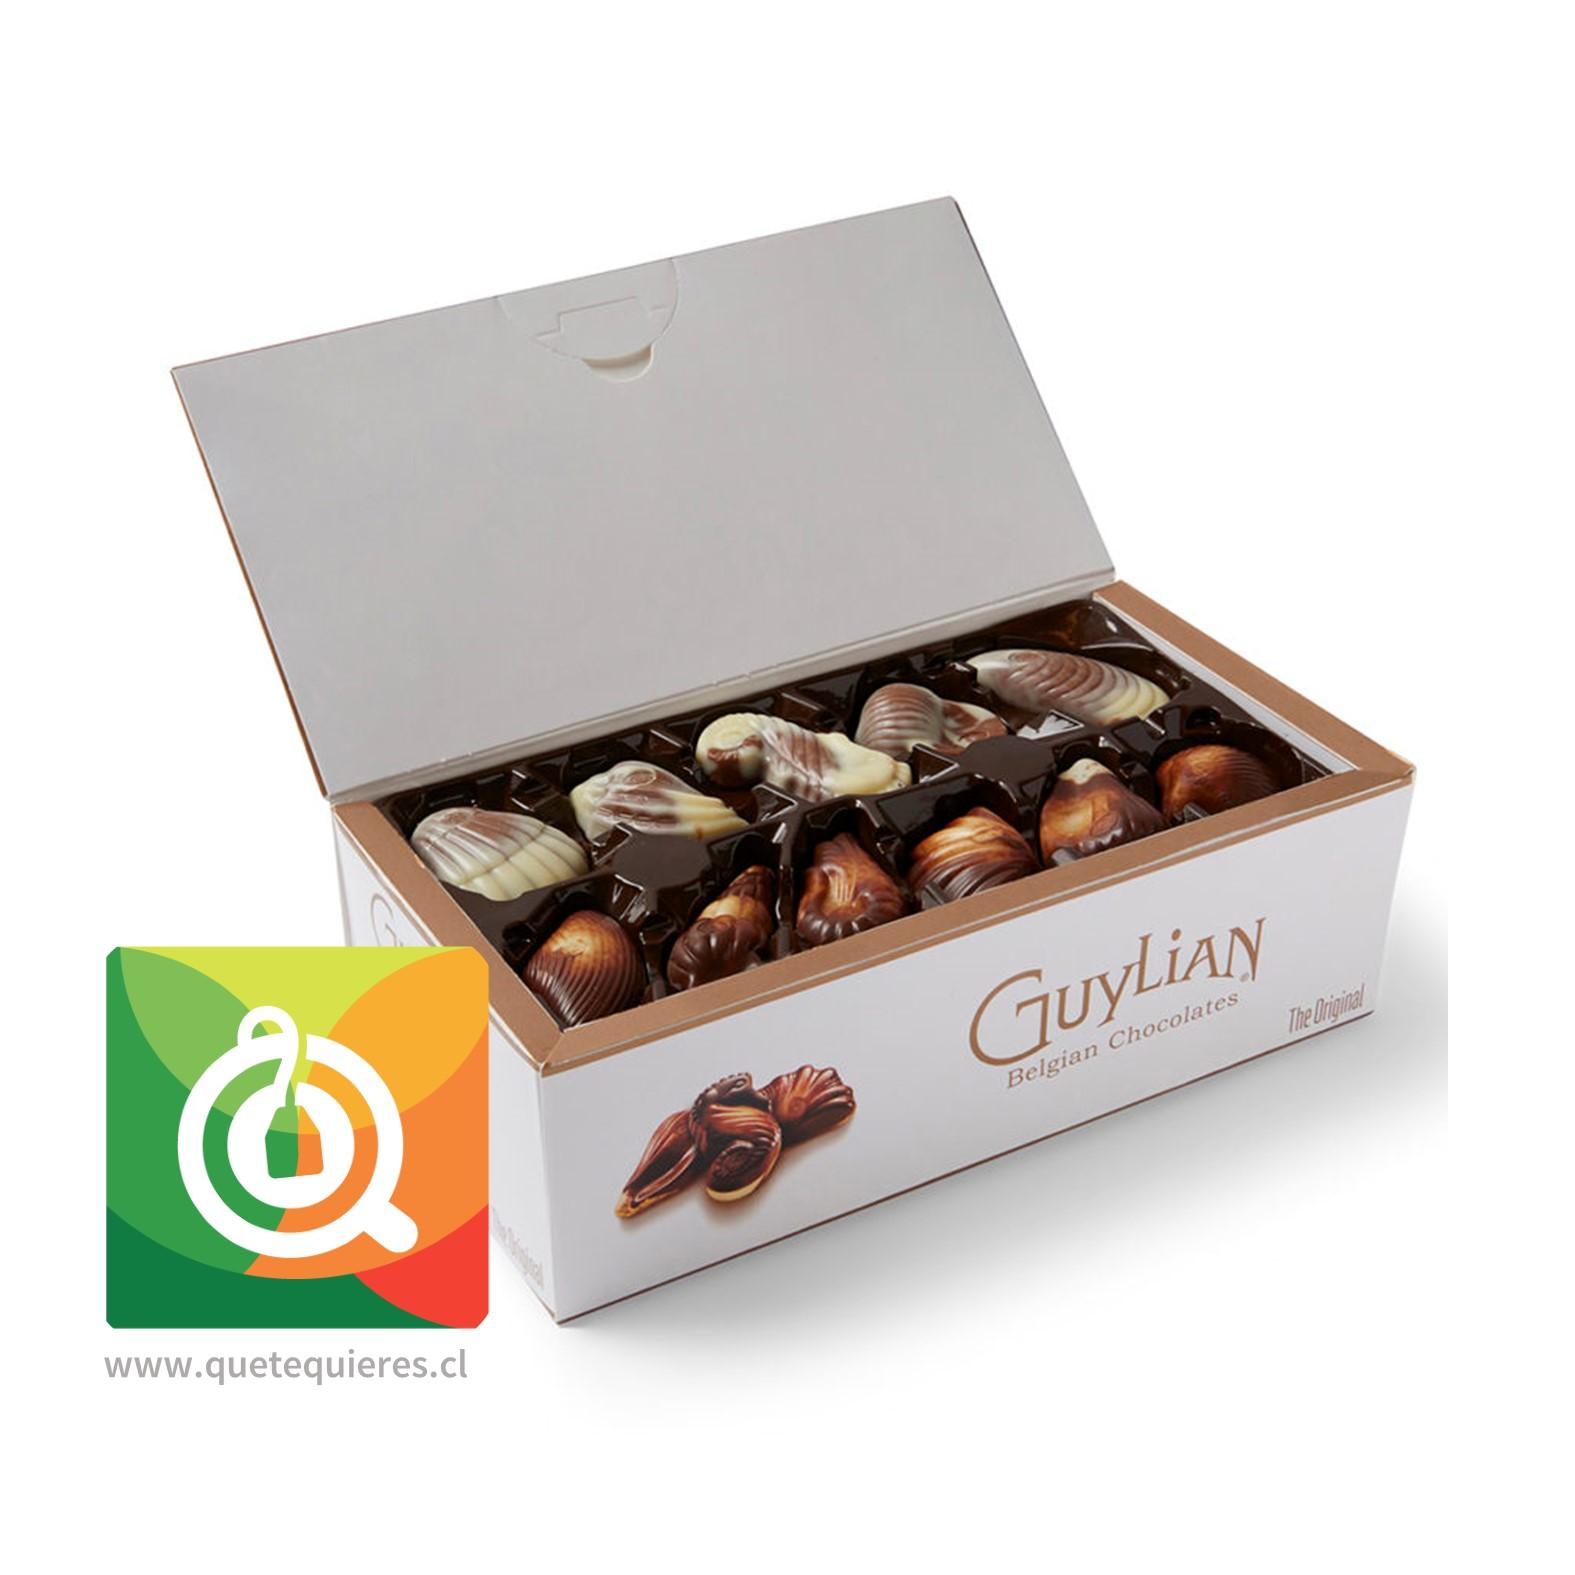 Guylian Bombon Chocolate Sea Shell Regalo Dorado- Image 2